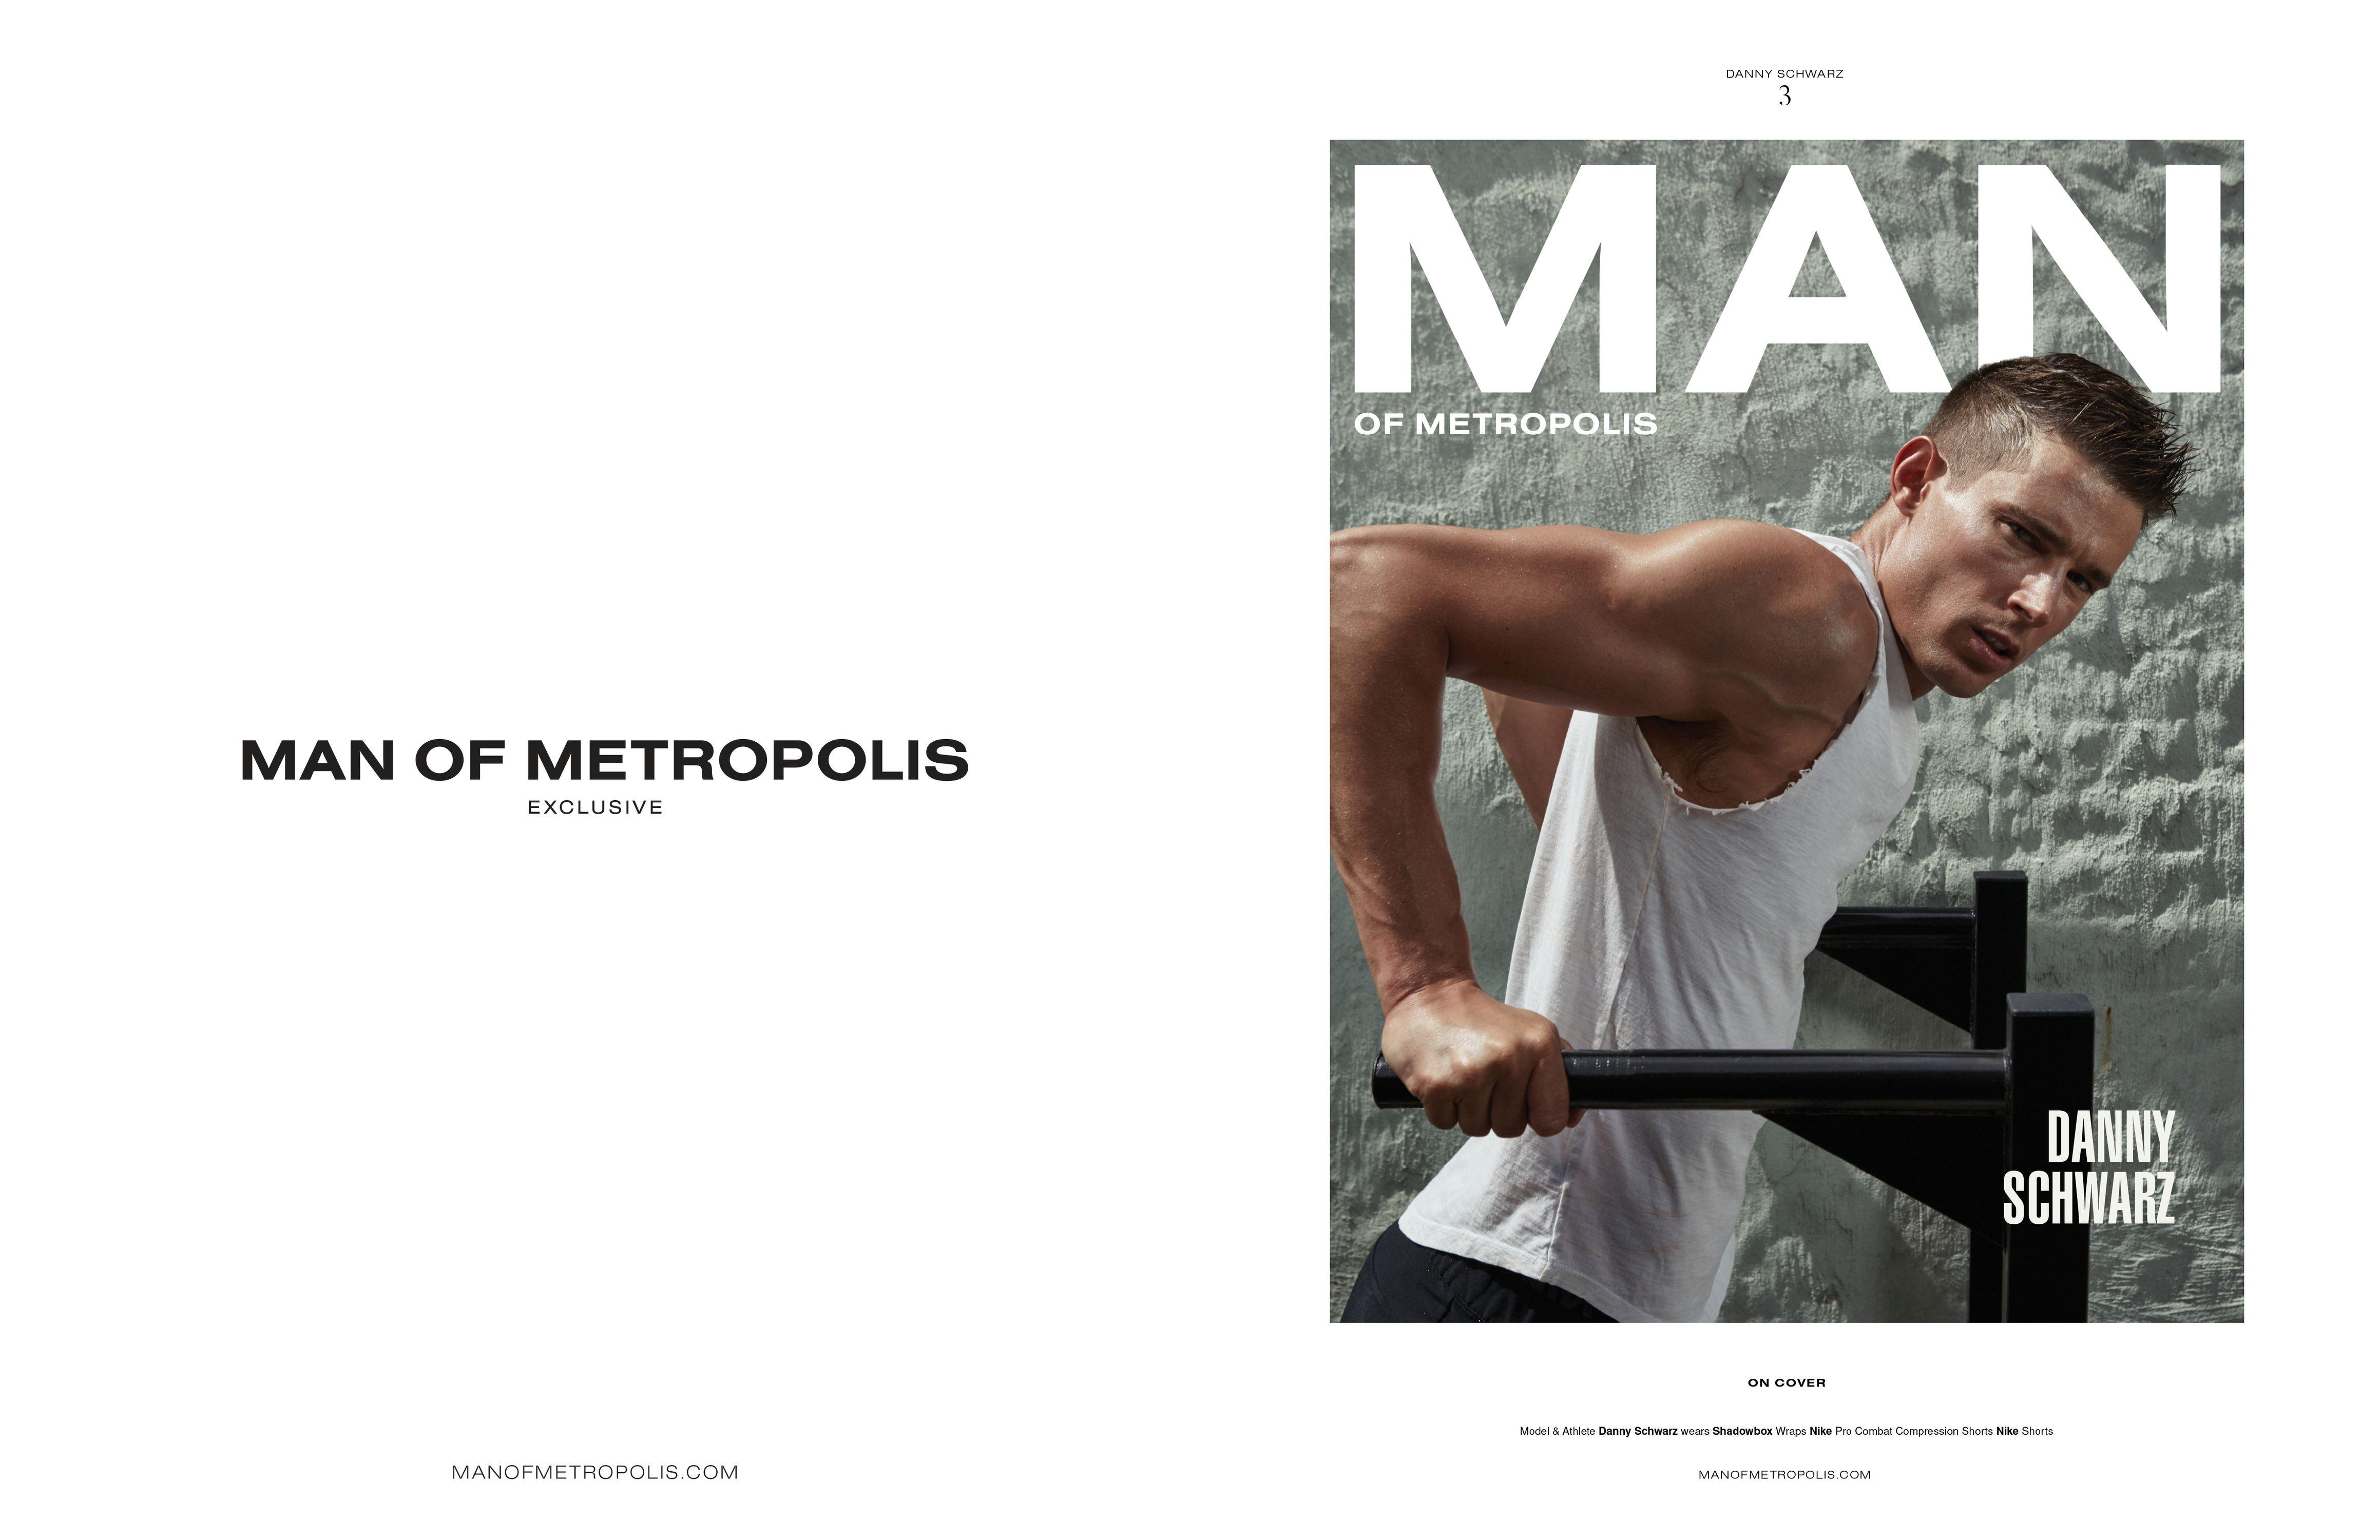 ManofMetropolis_2019_Fitness22.jpg